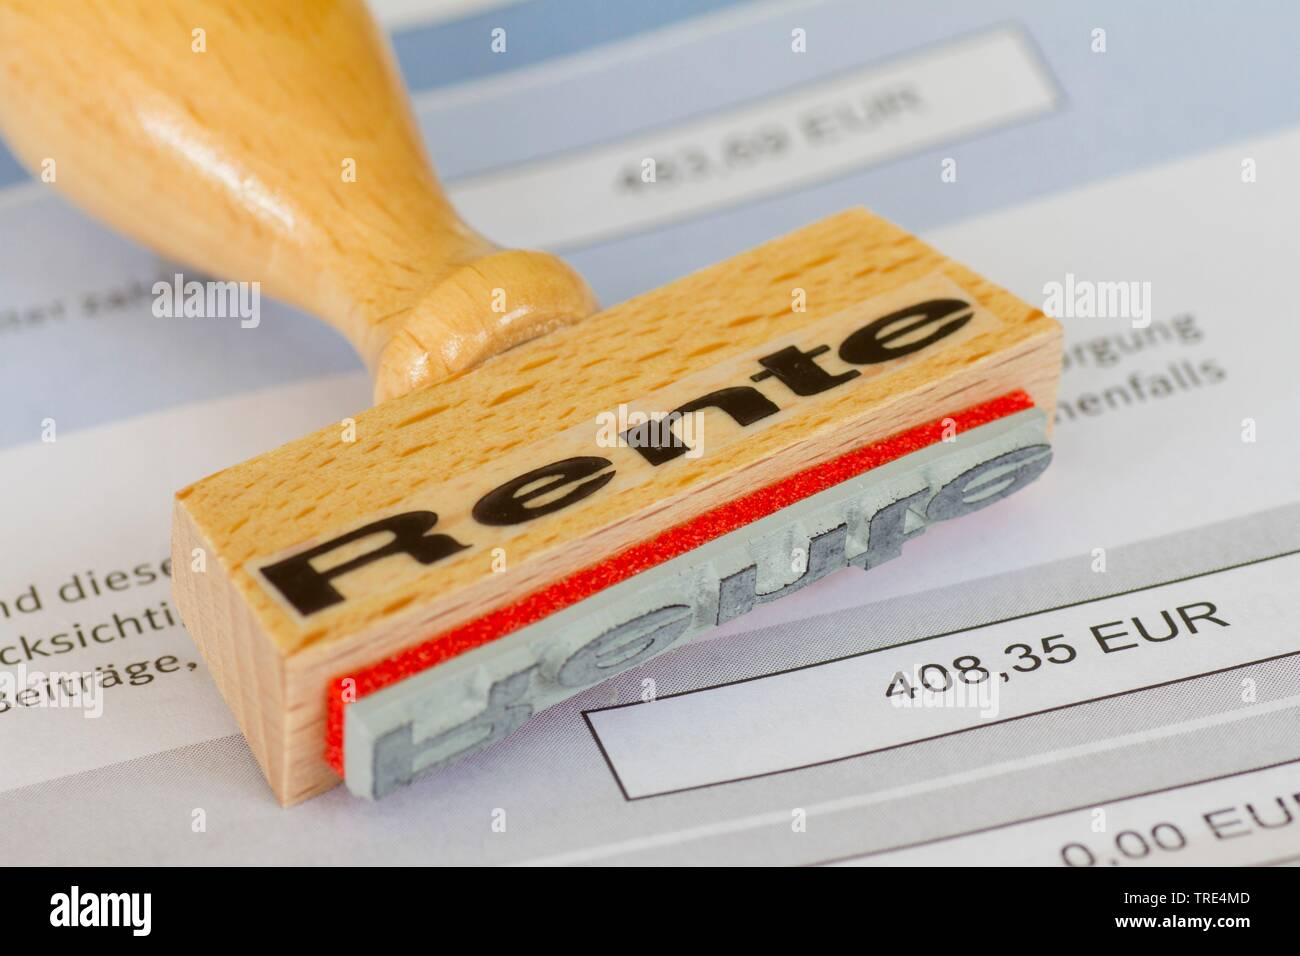 Stempel mit Aufschrift Rente, Deutschland | stamp lettering Rente, pension, Germany | BLWS517210.jpg [ (c) blickwinkel/McPHOTO/A. Pulwey Tel. +49 (0)2 - Stock Image